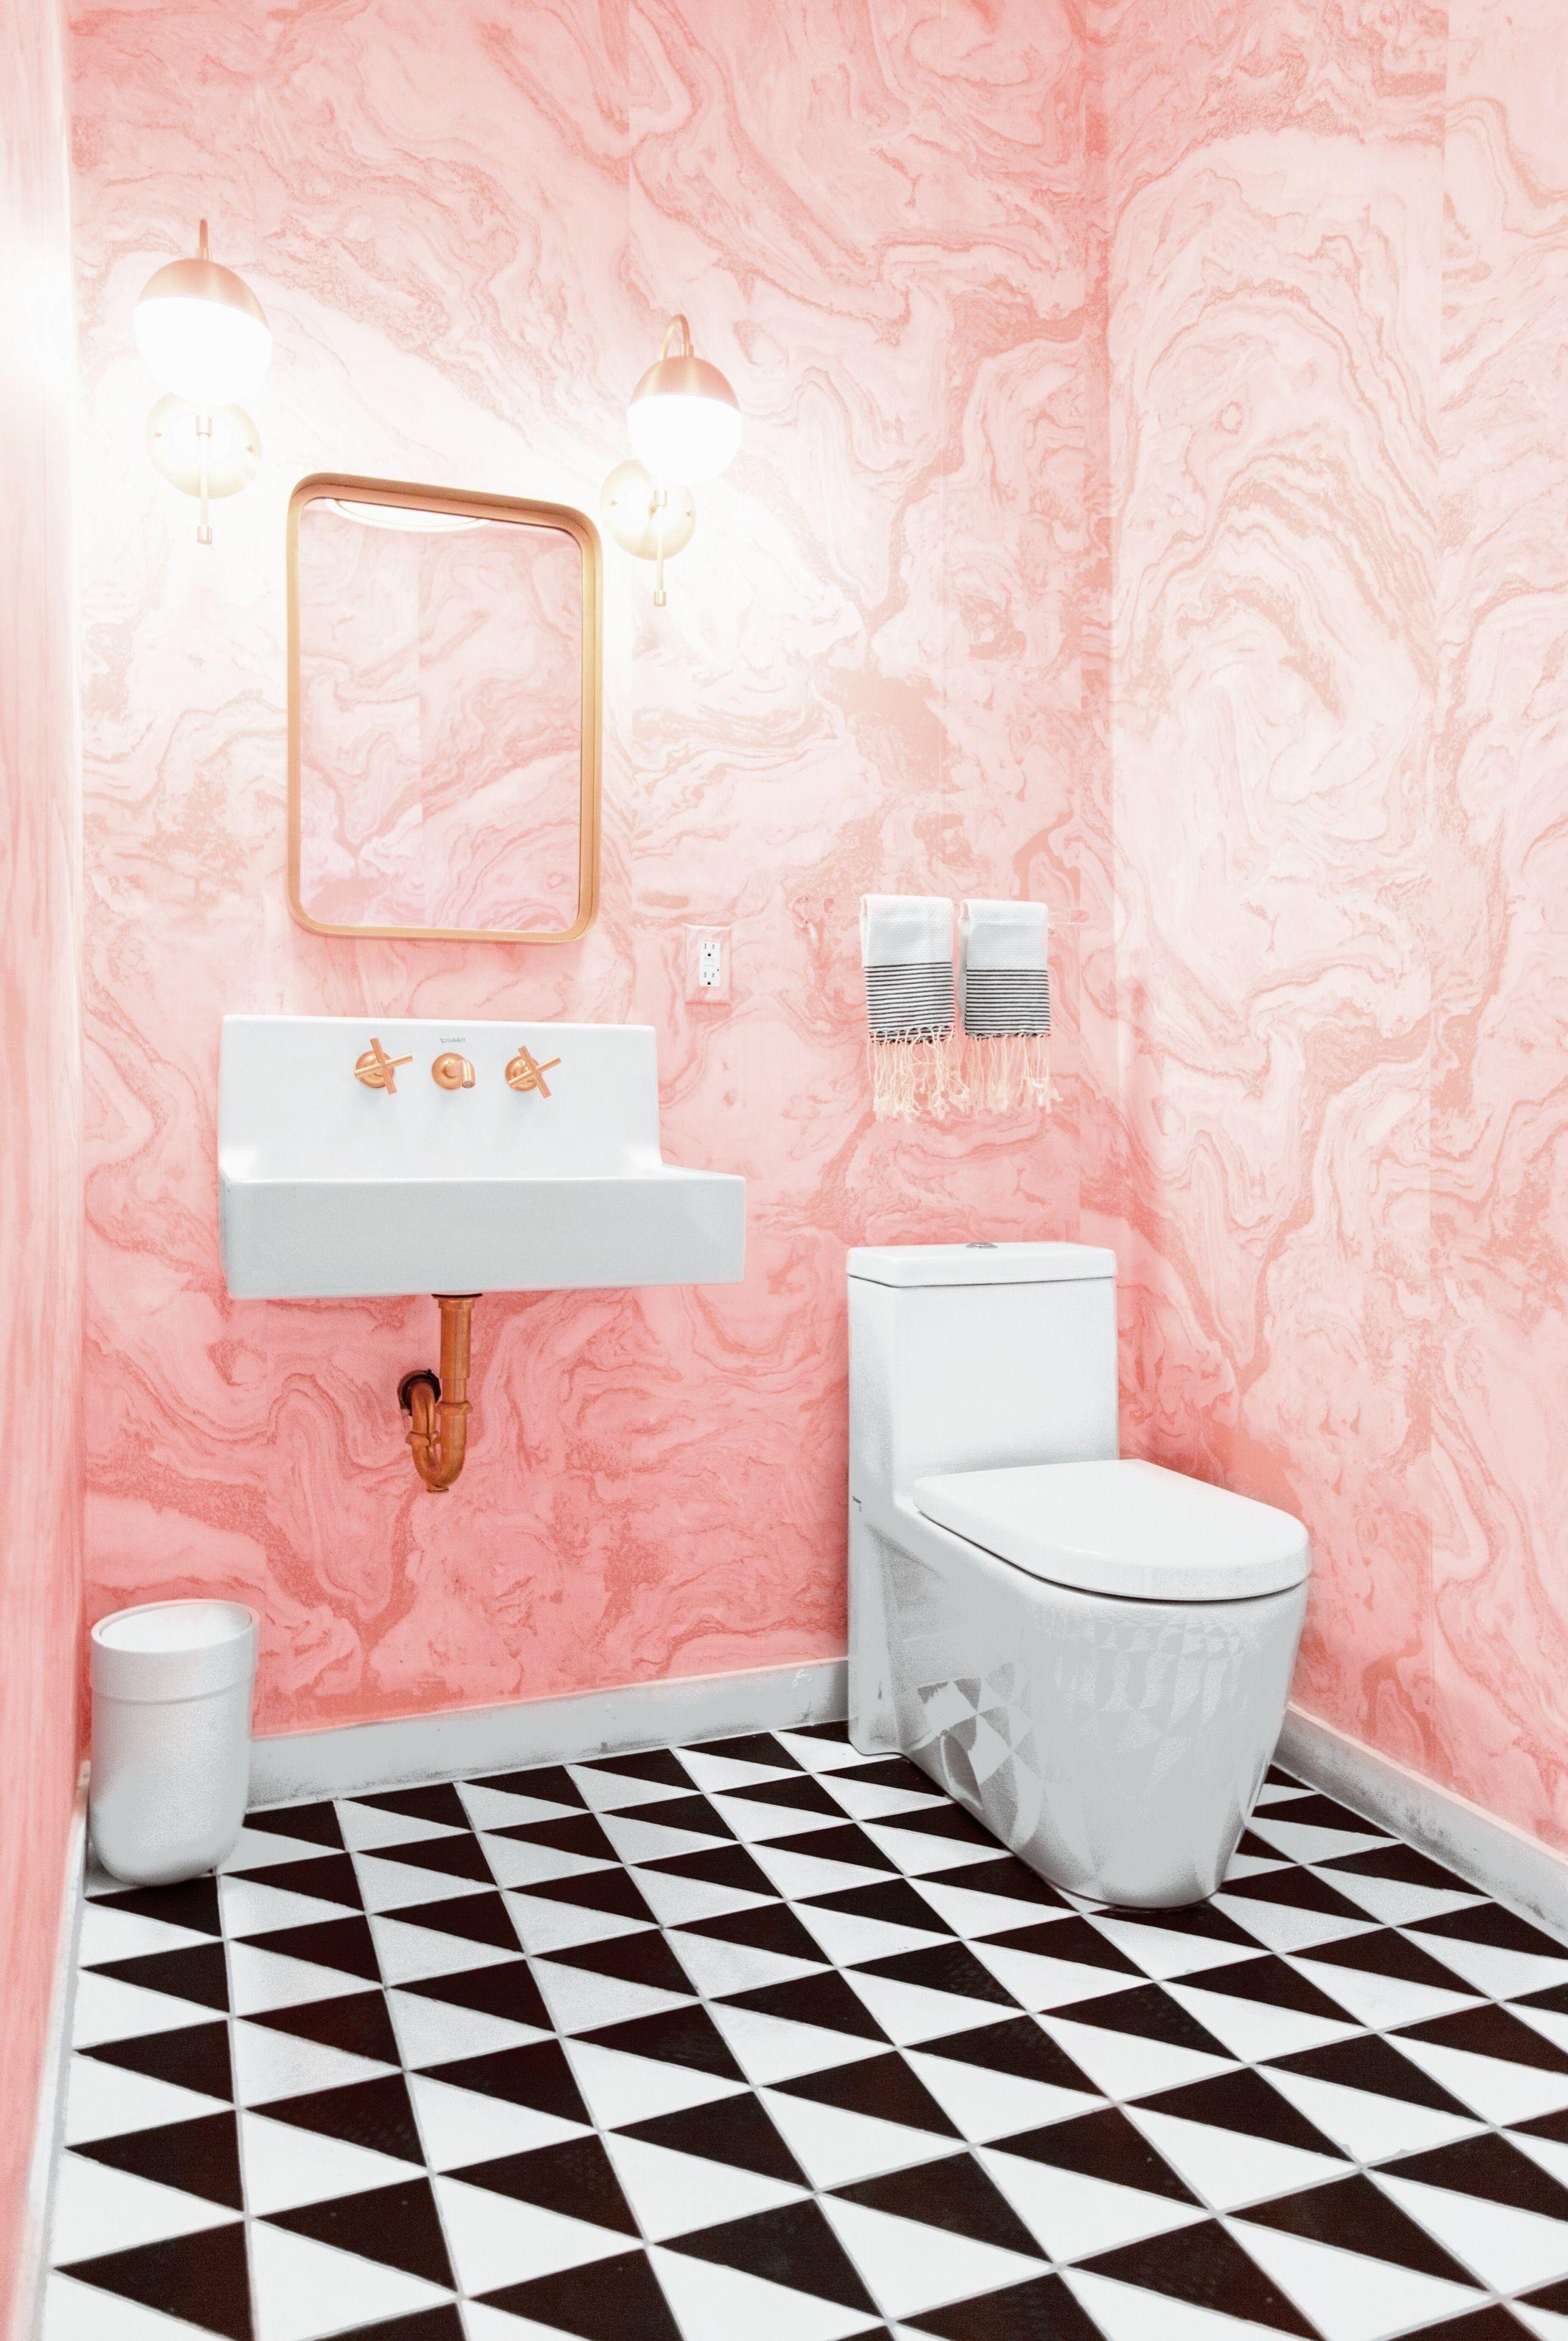 Creating The Glam Modern Bathroom At Light Lab Anne Sage Bathroom Decor Pink Bathroom Bathroom Design